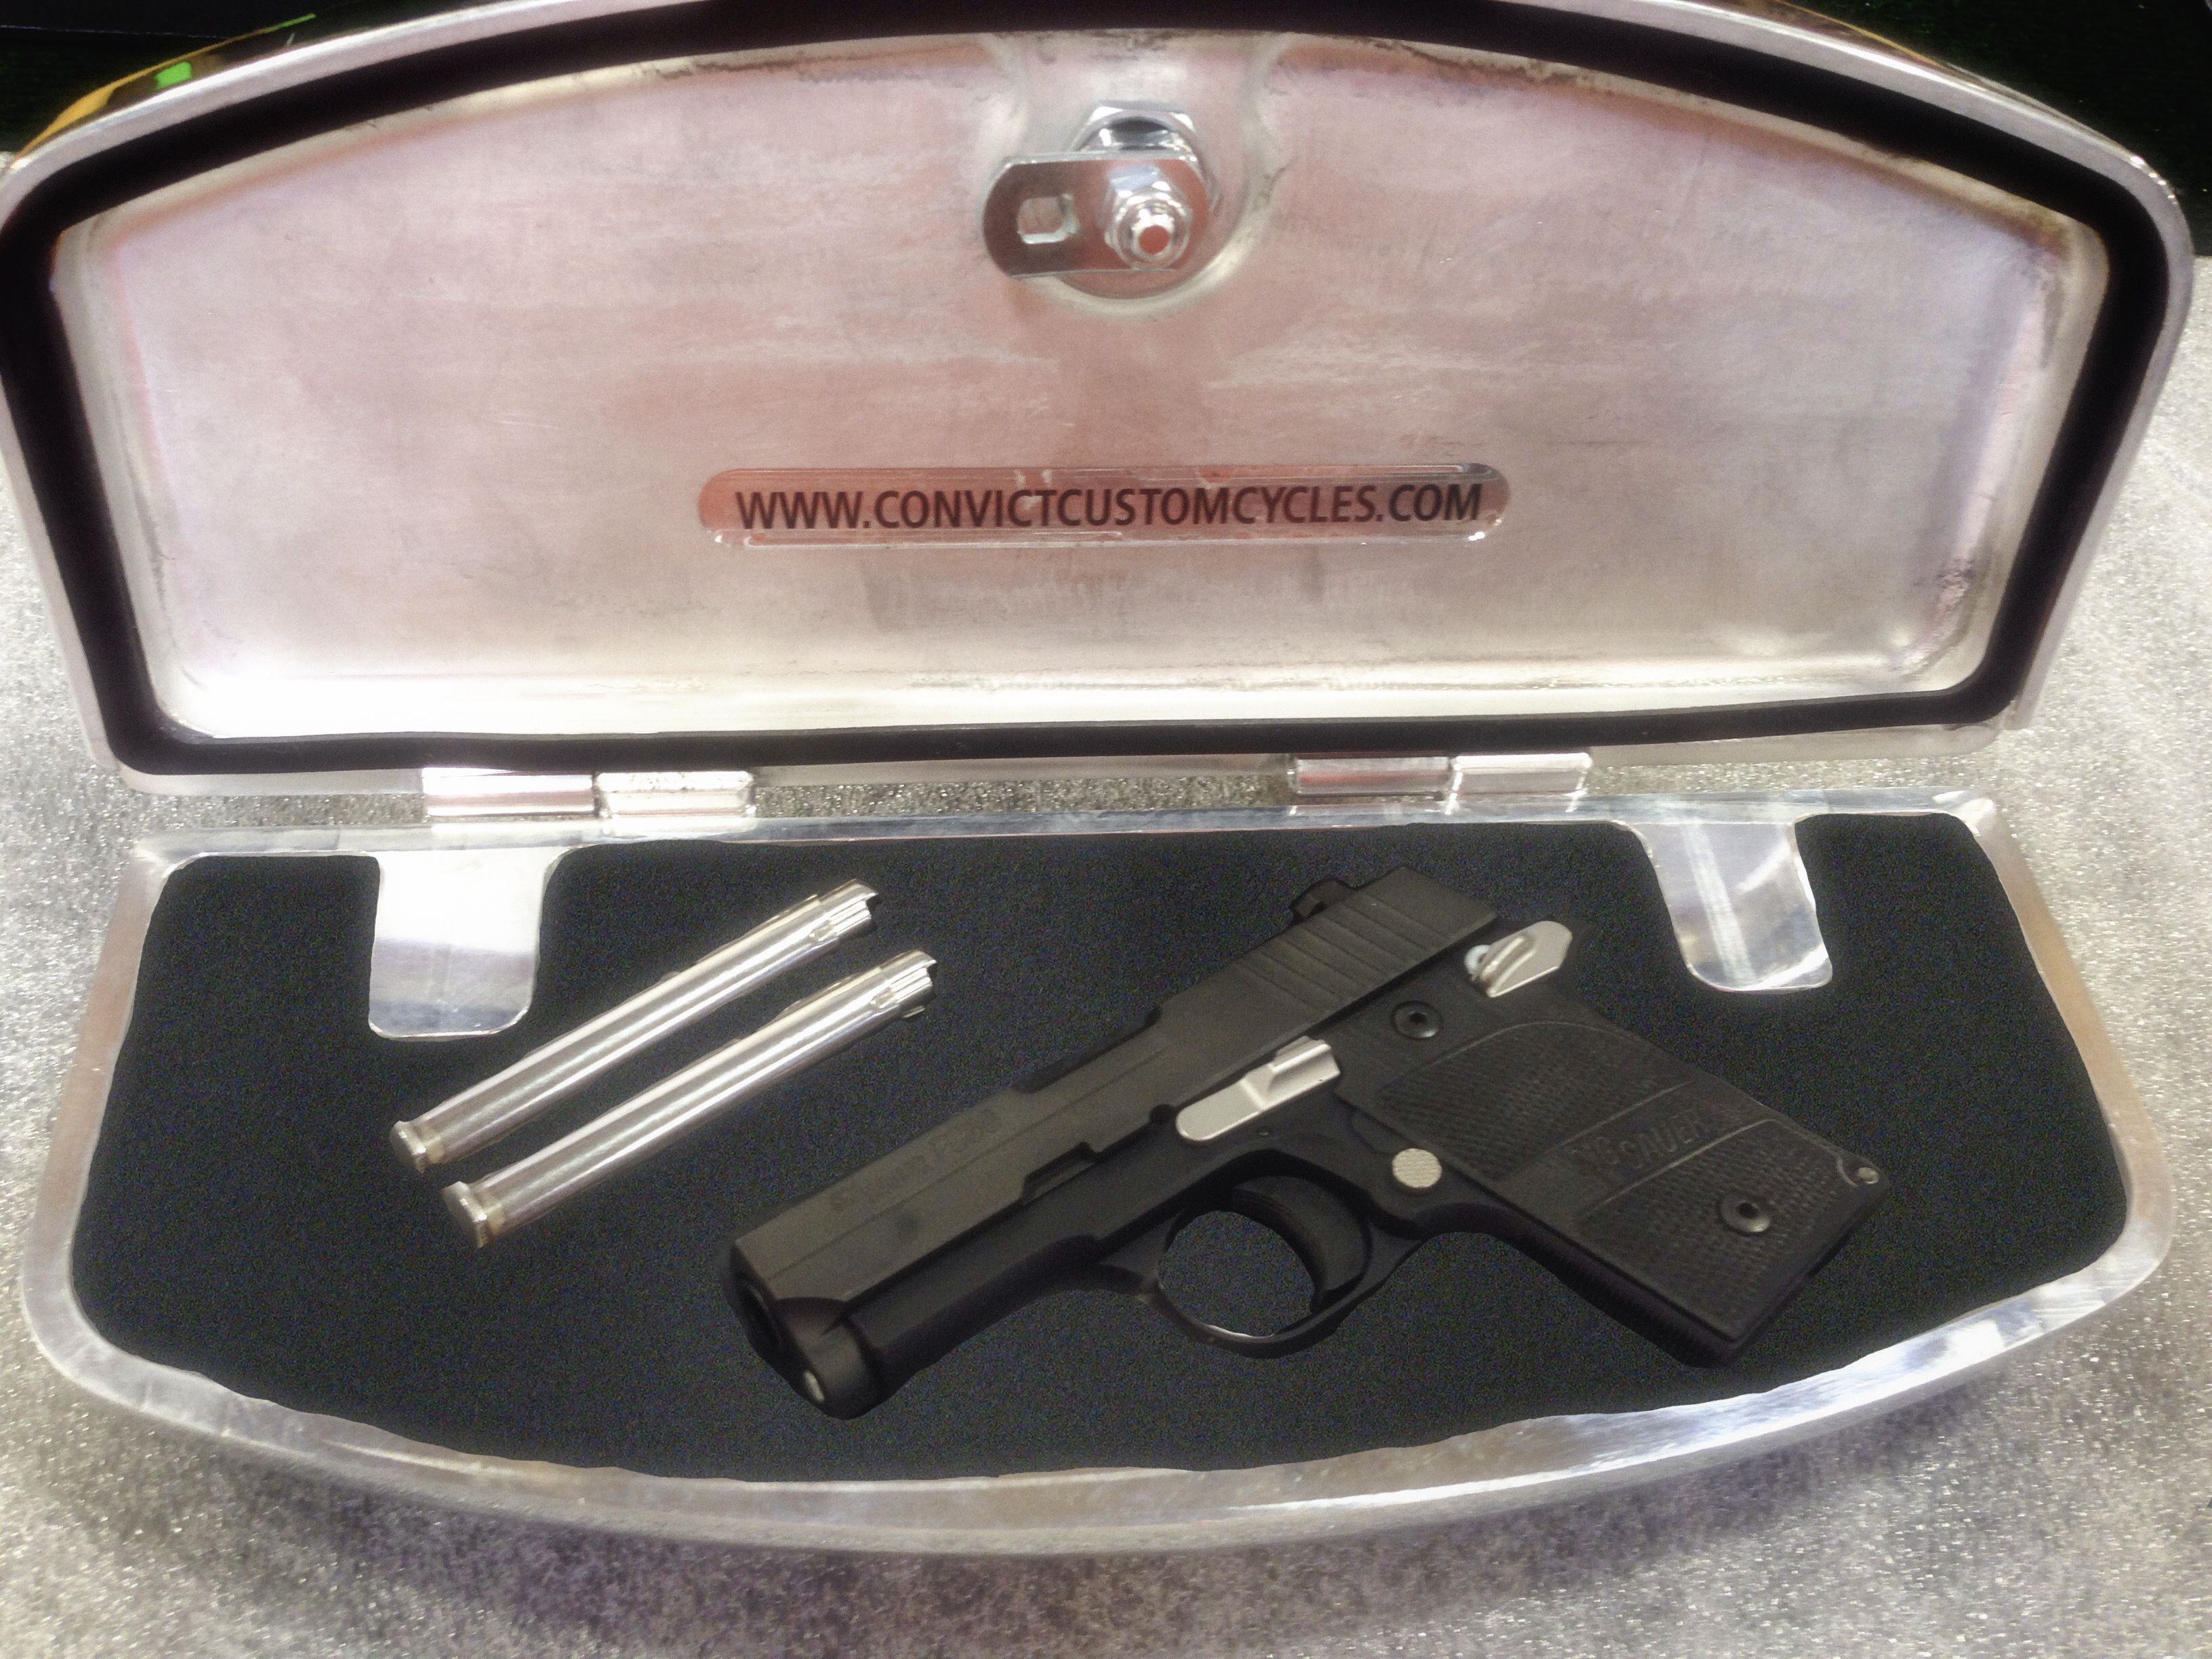 Convict Custom Cycles, Floor Board Gun Safe